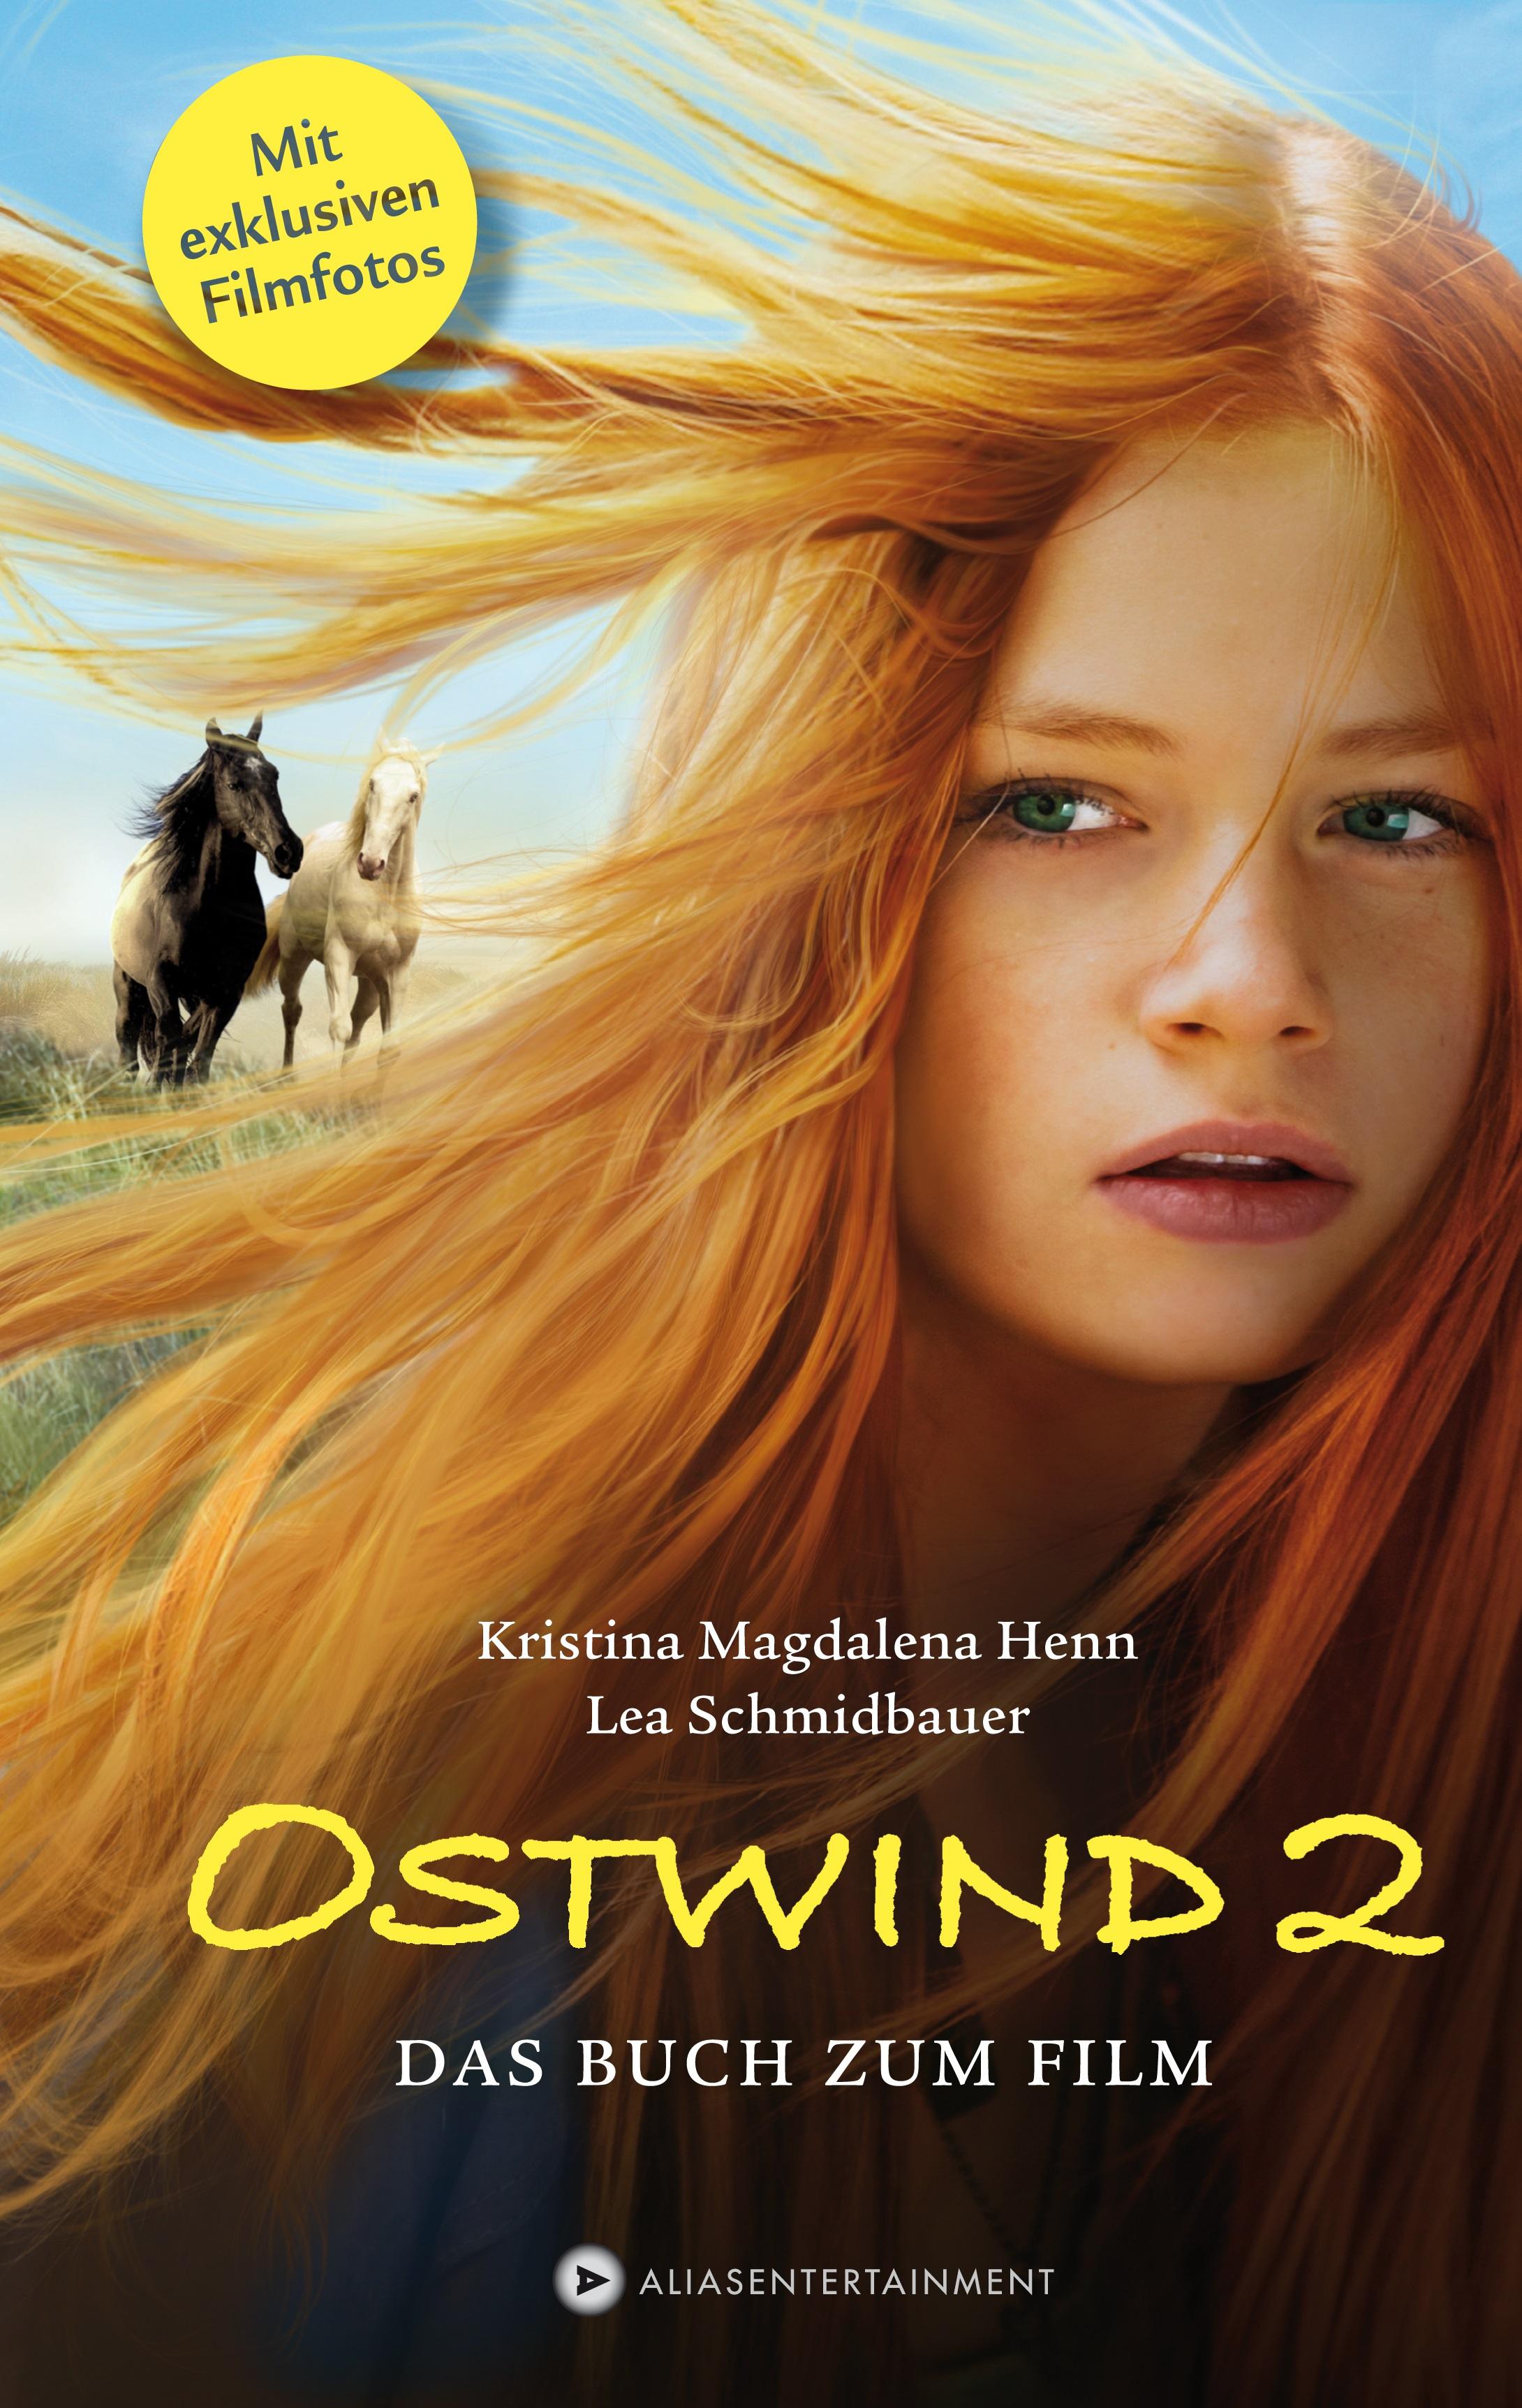 Ostwind 2 - Das Buch zum Film - Henn, Kristina Magdalena